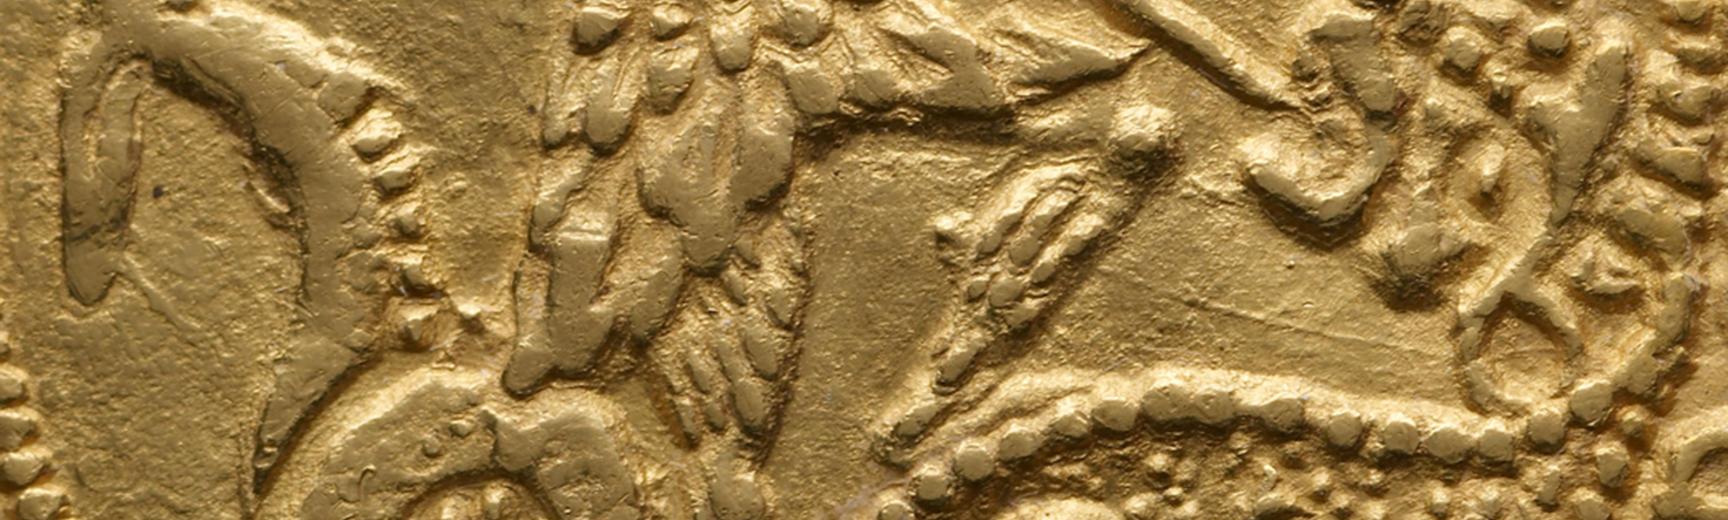 HCR4884 Edward IV Coin